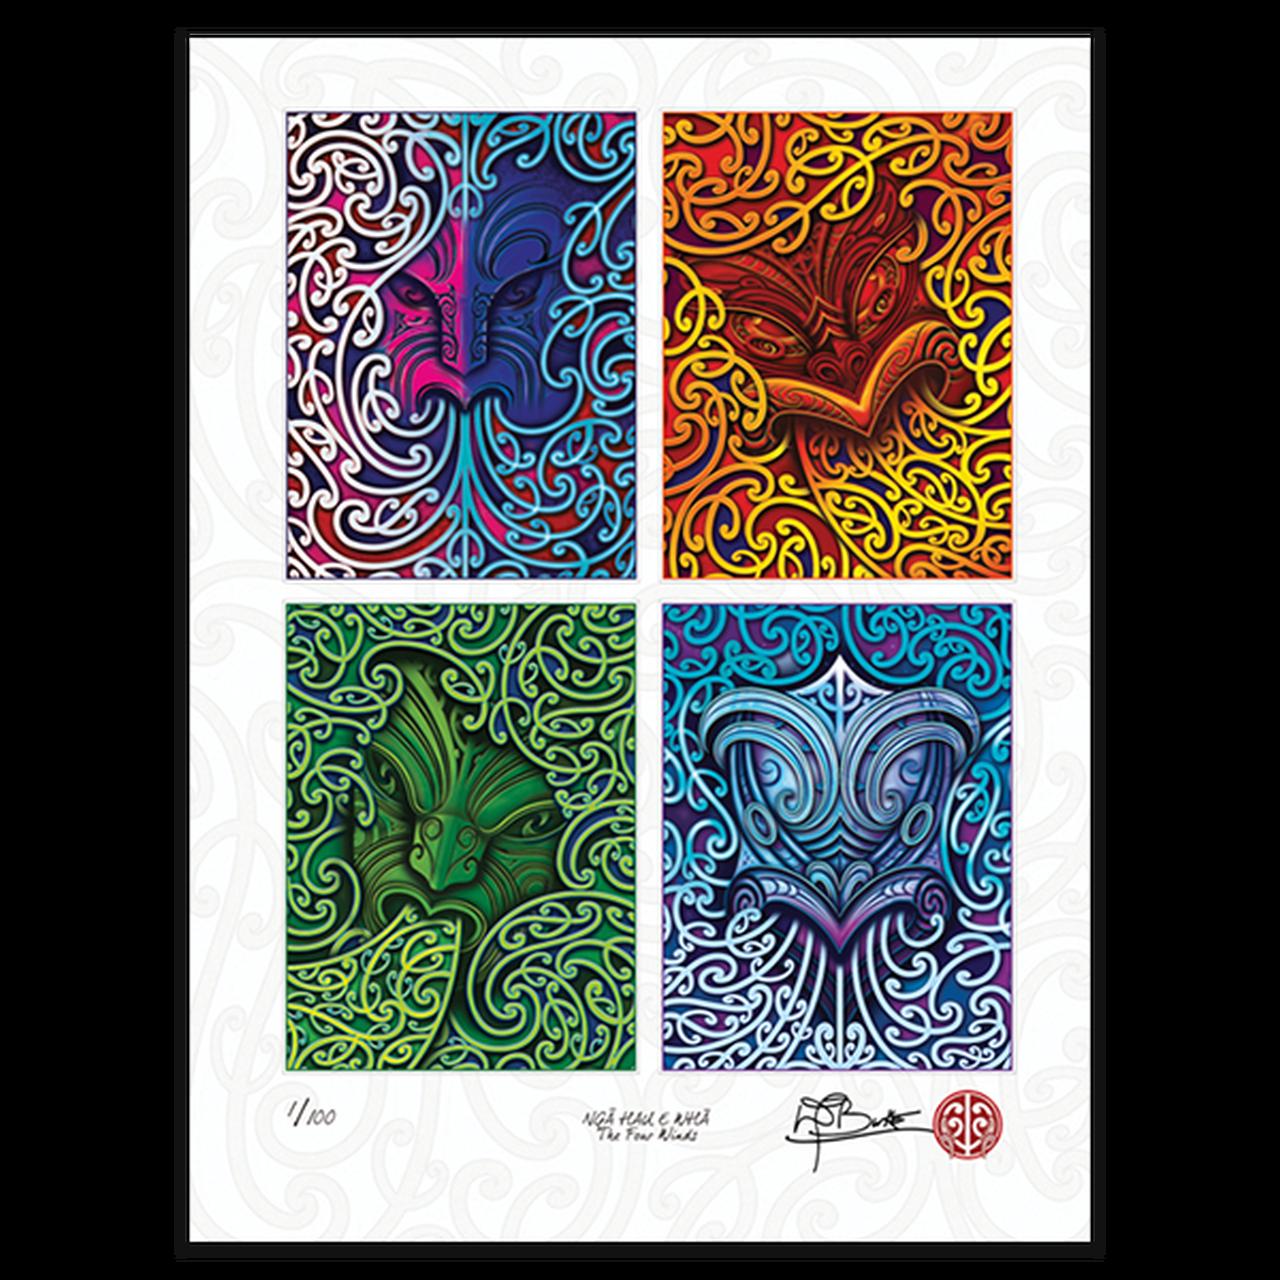 Ngā Hau e Whā - The Four Winds limited edition artist print | NZ Post Collectables